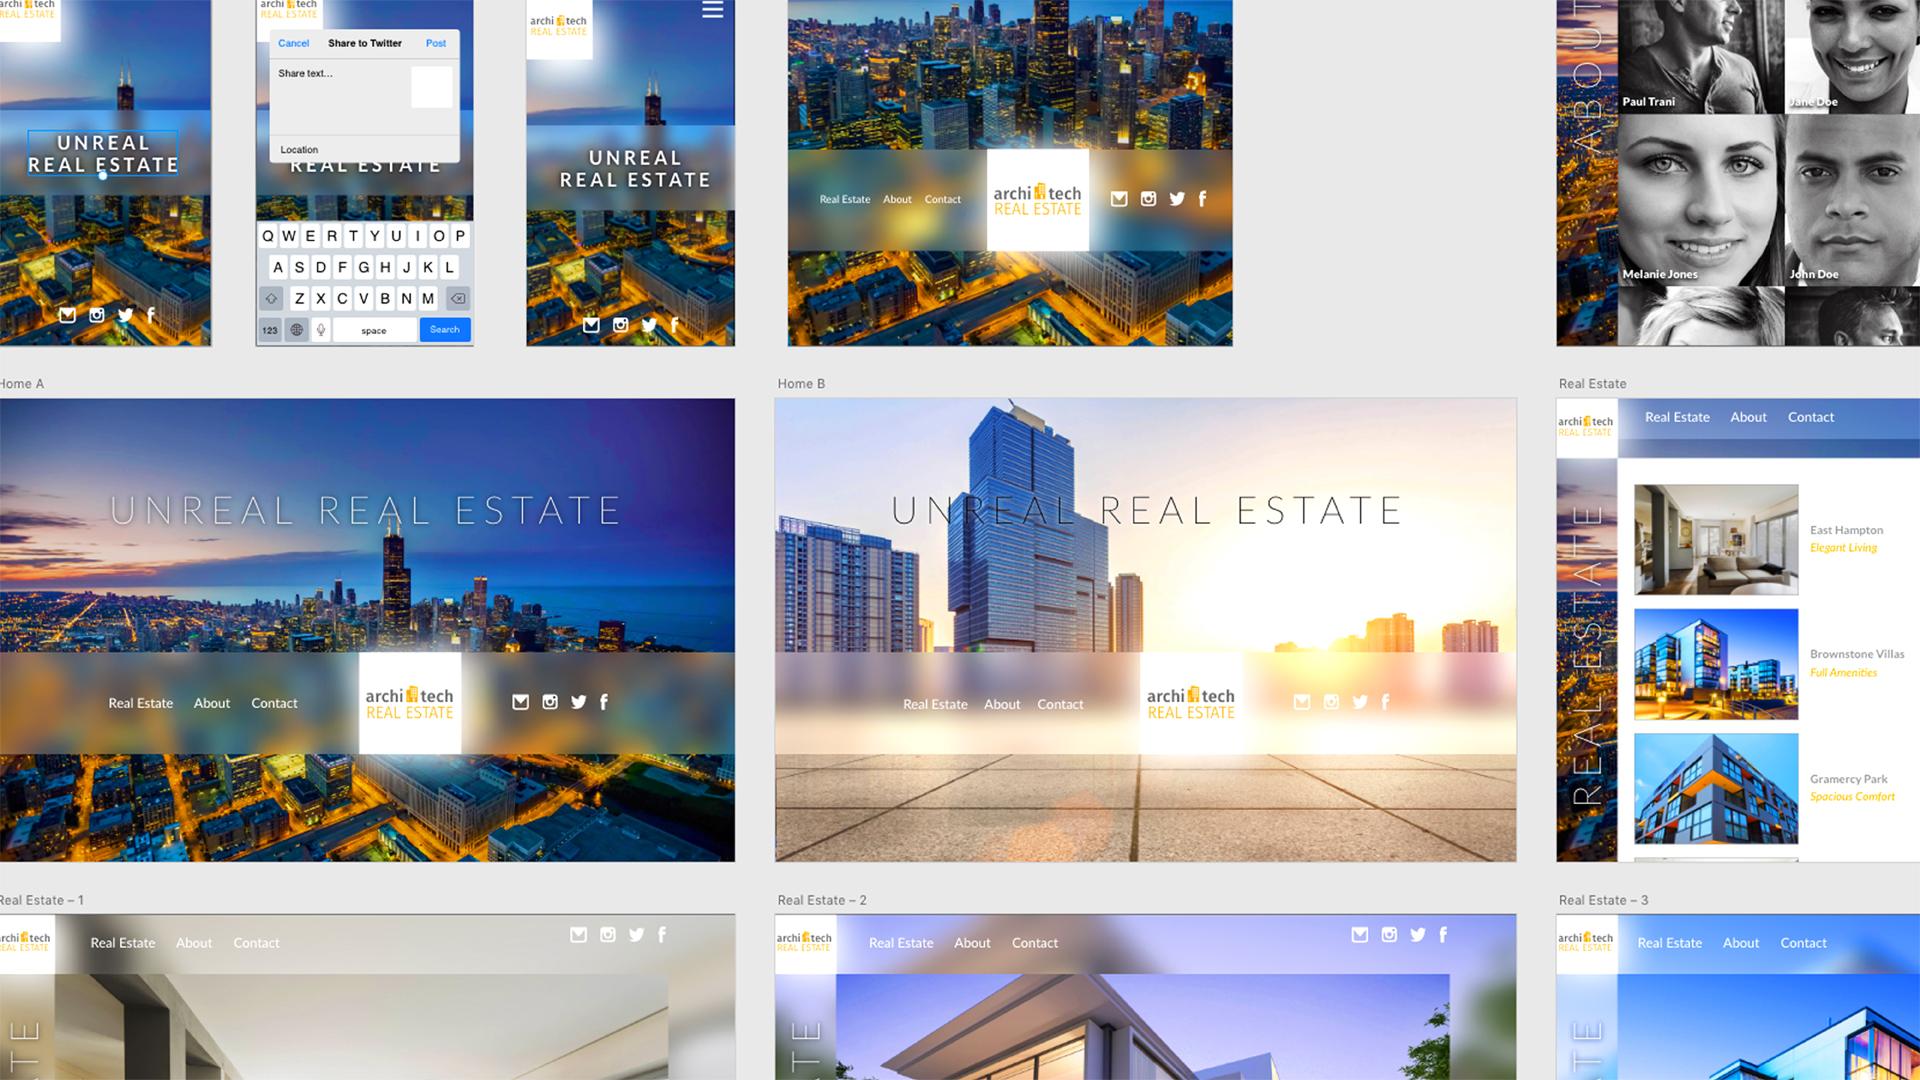 Adobe XD: Design a Website